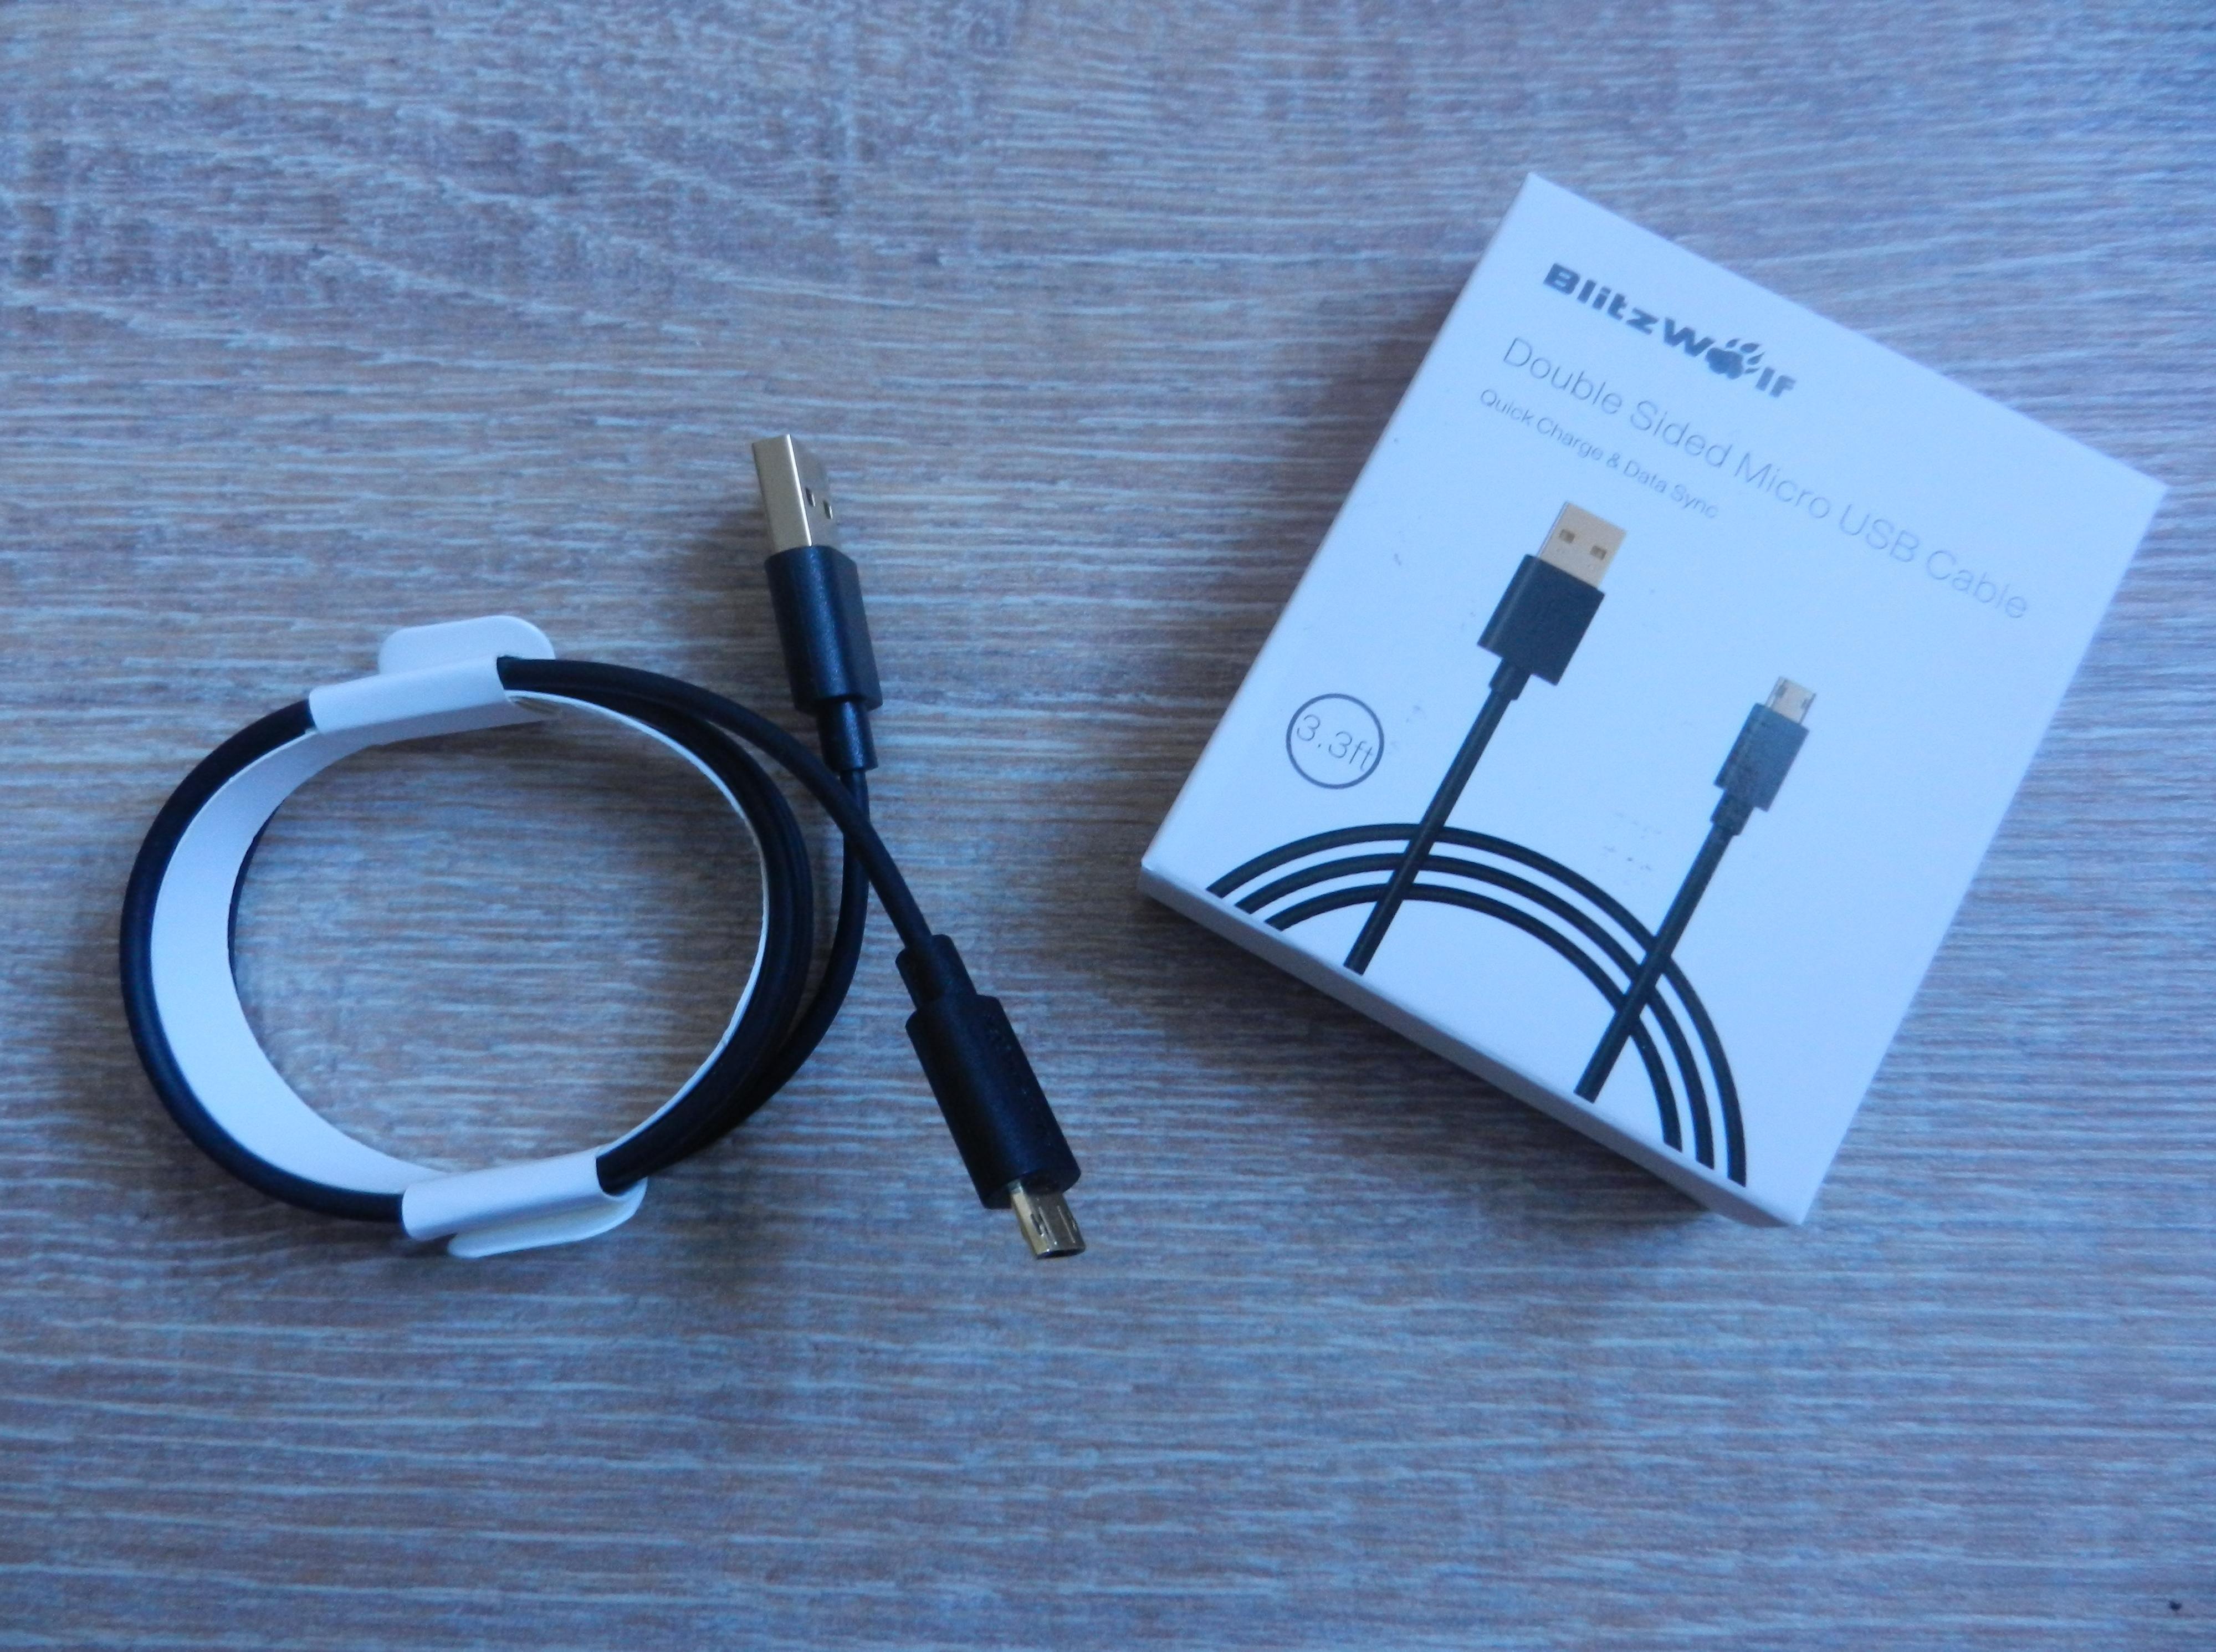 Blitzwolf - double sided - MicroUSB-USB A